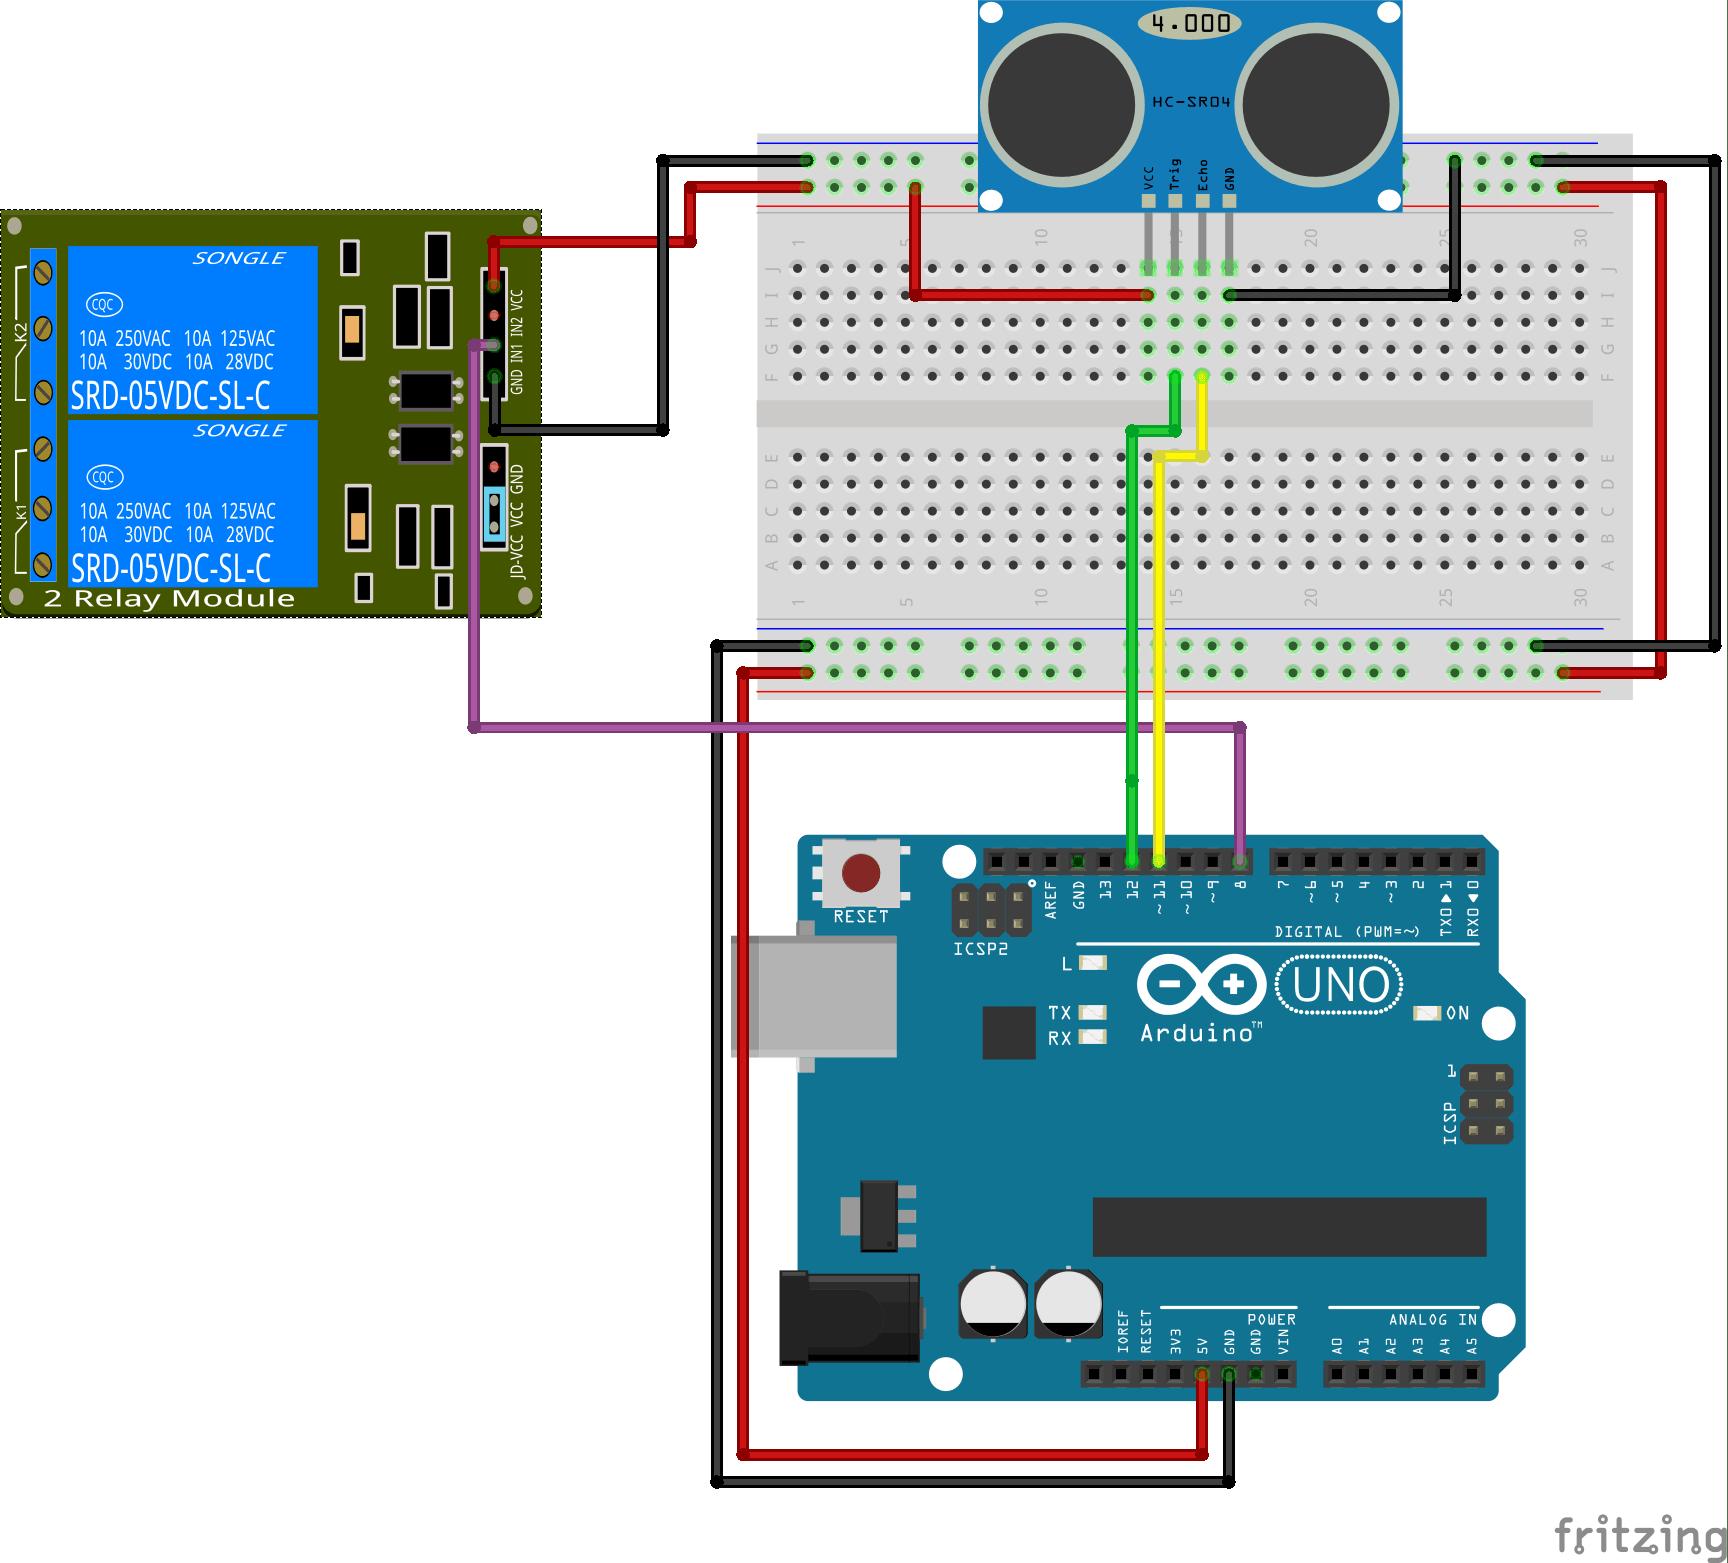 hight resolution of leviton ceiling occupancy sensor wiring diagram leviton photo sensor wiring diagram watt stopper ls 102